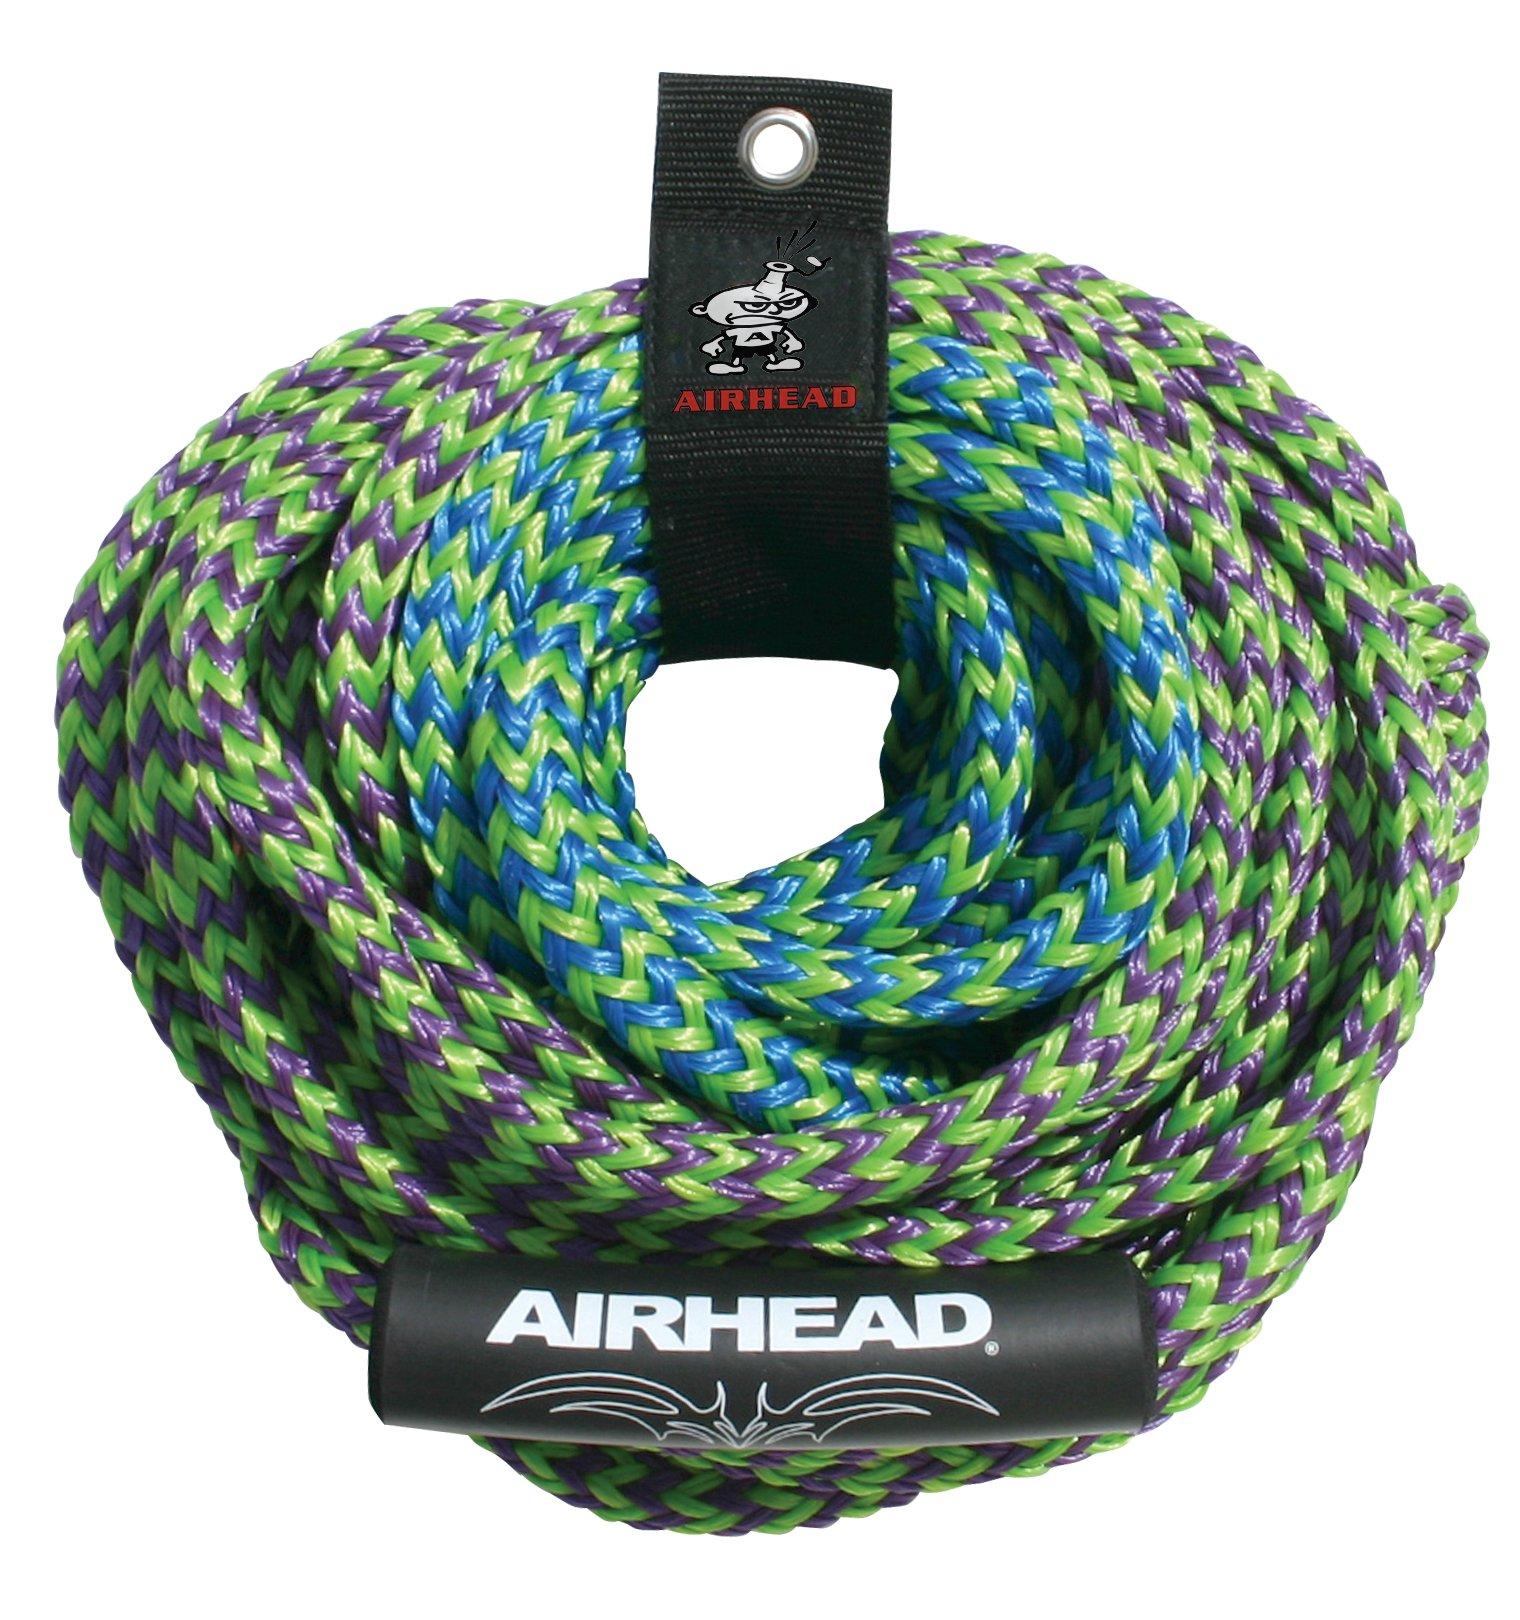 AIRHEAD 4 Rider Tube Rope